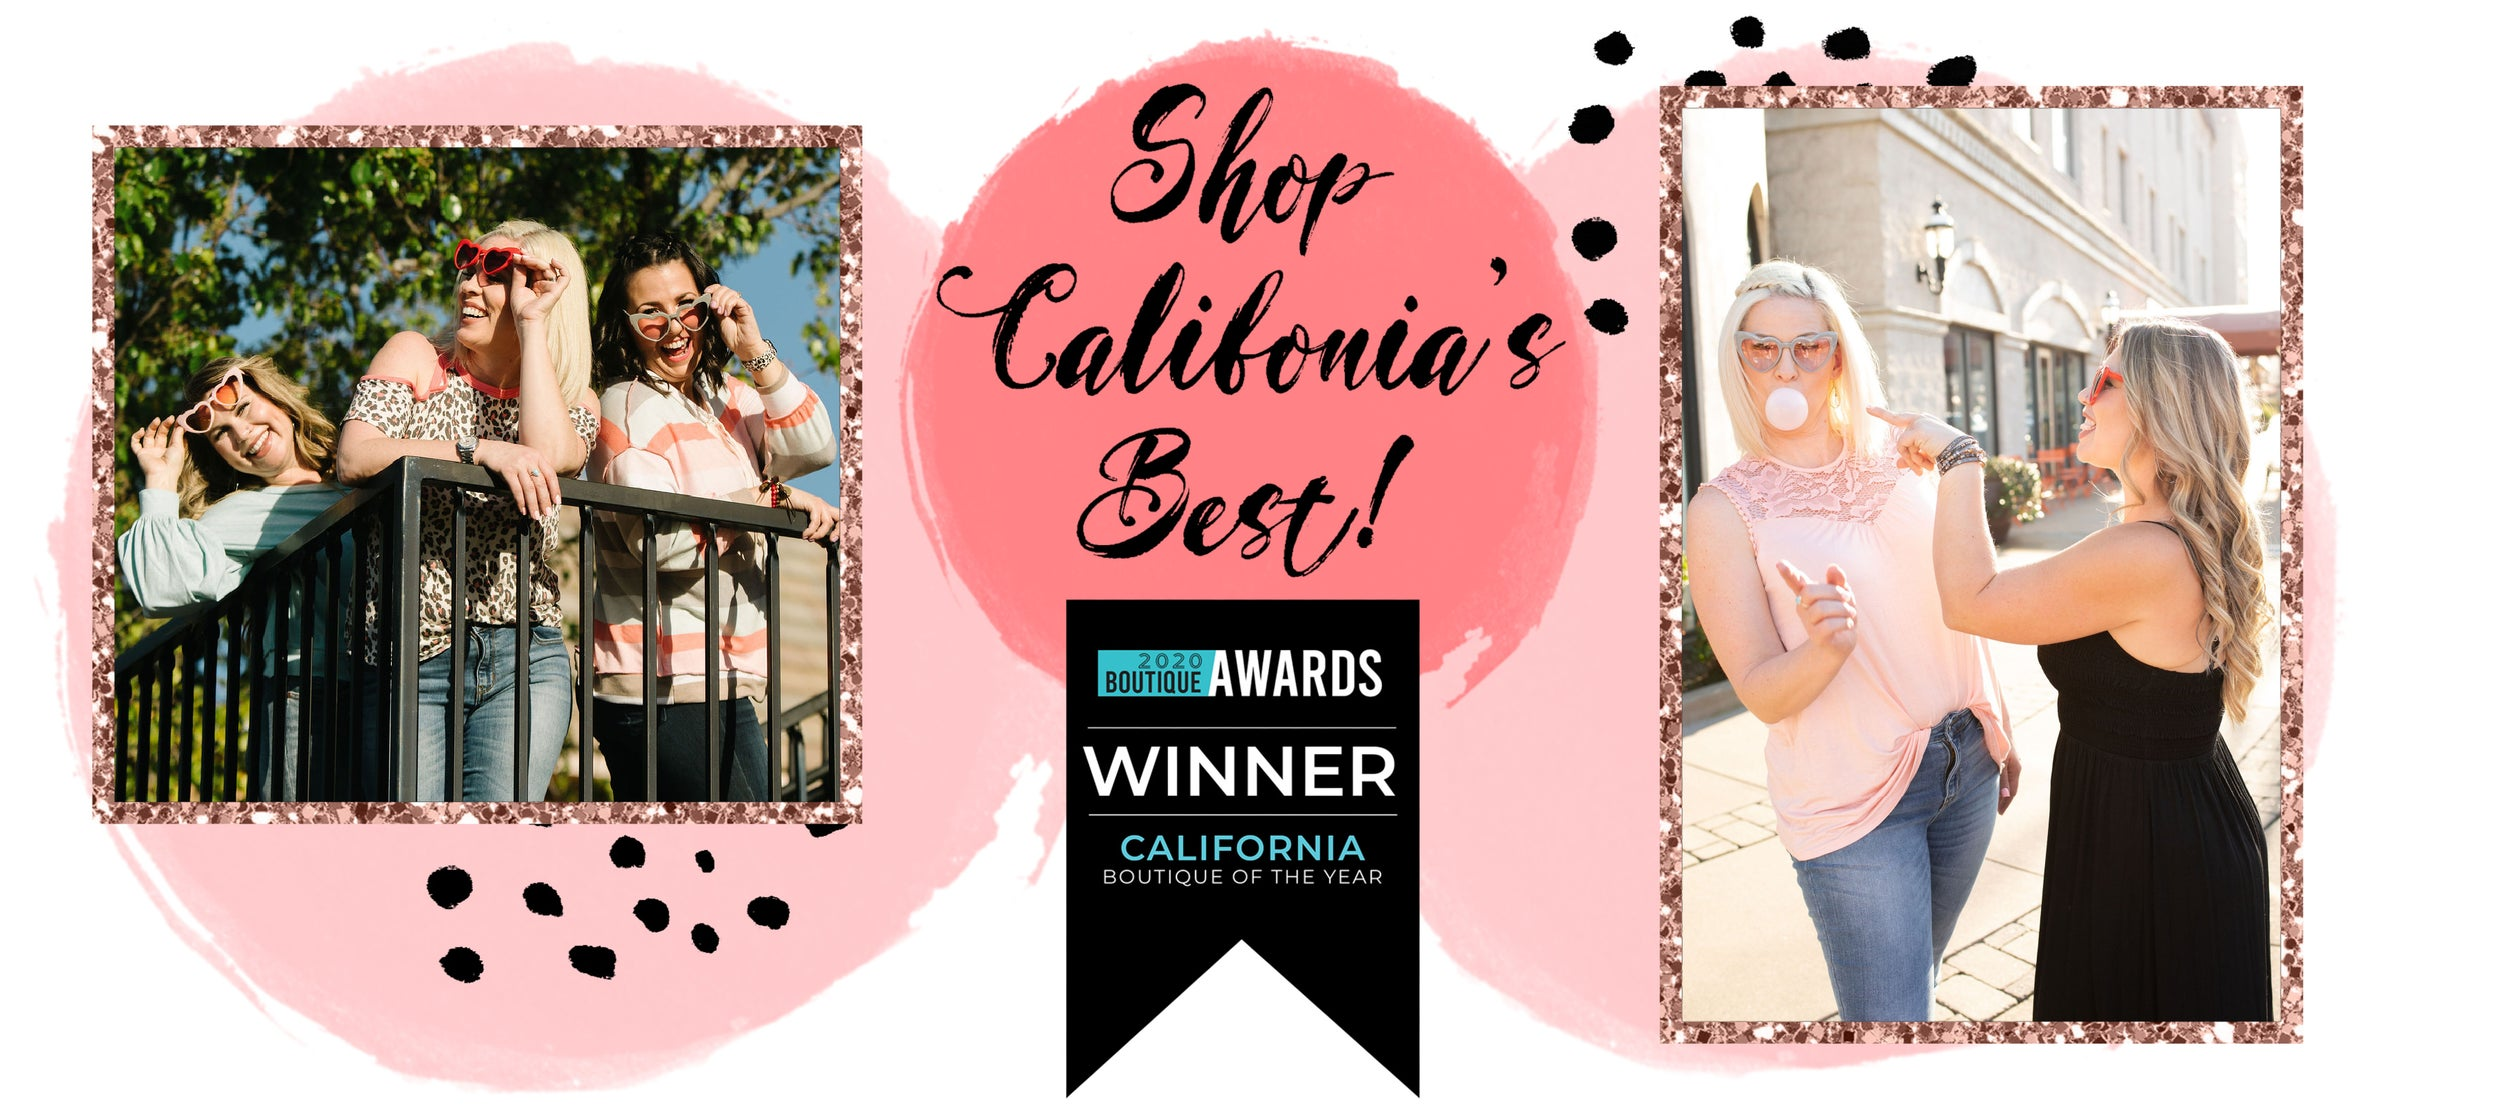 SHOP CALIFORNIA'S BEST!!!